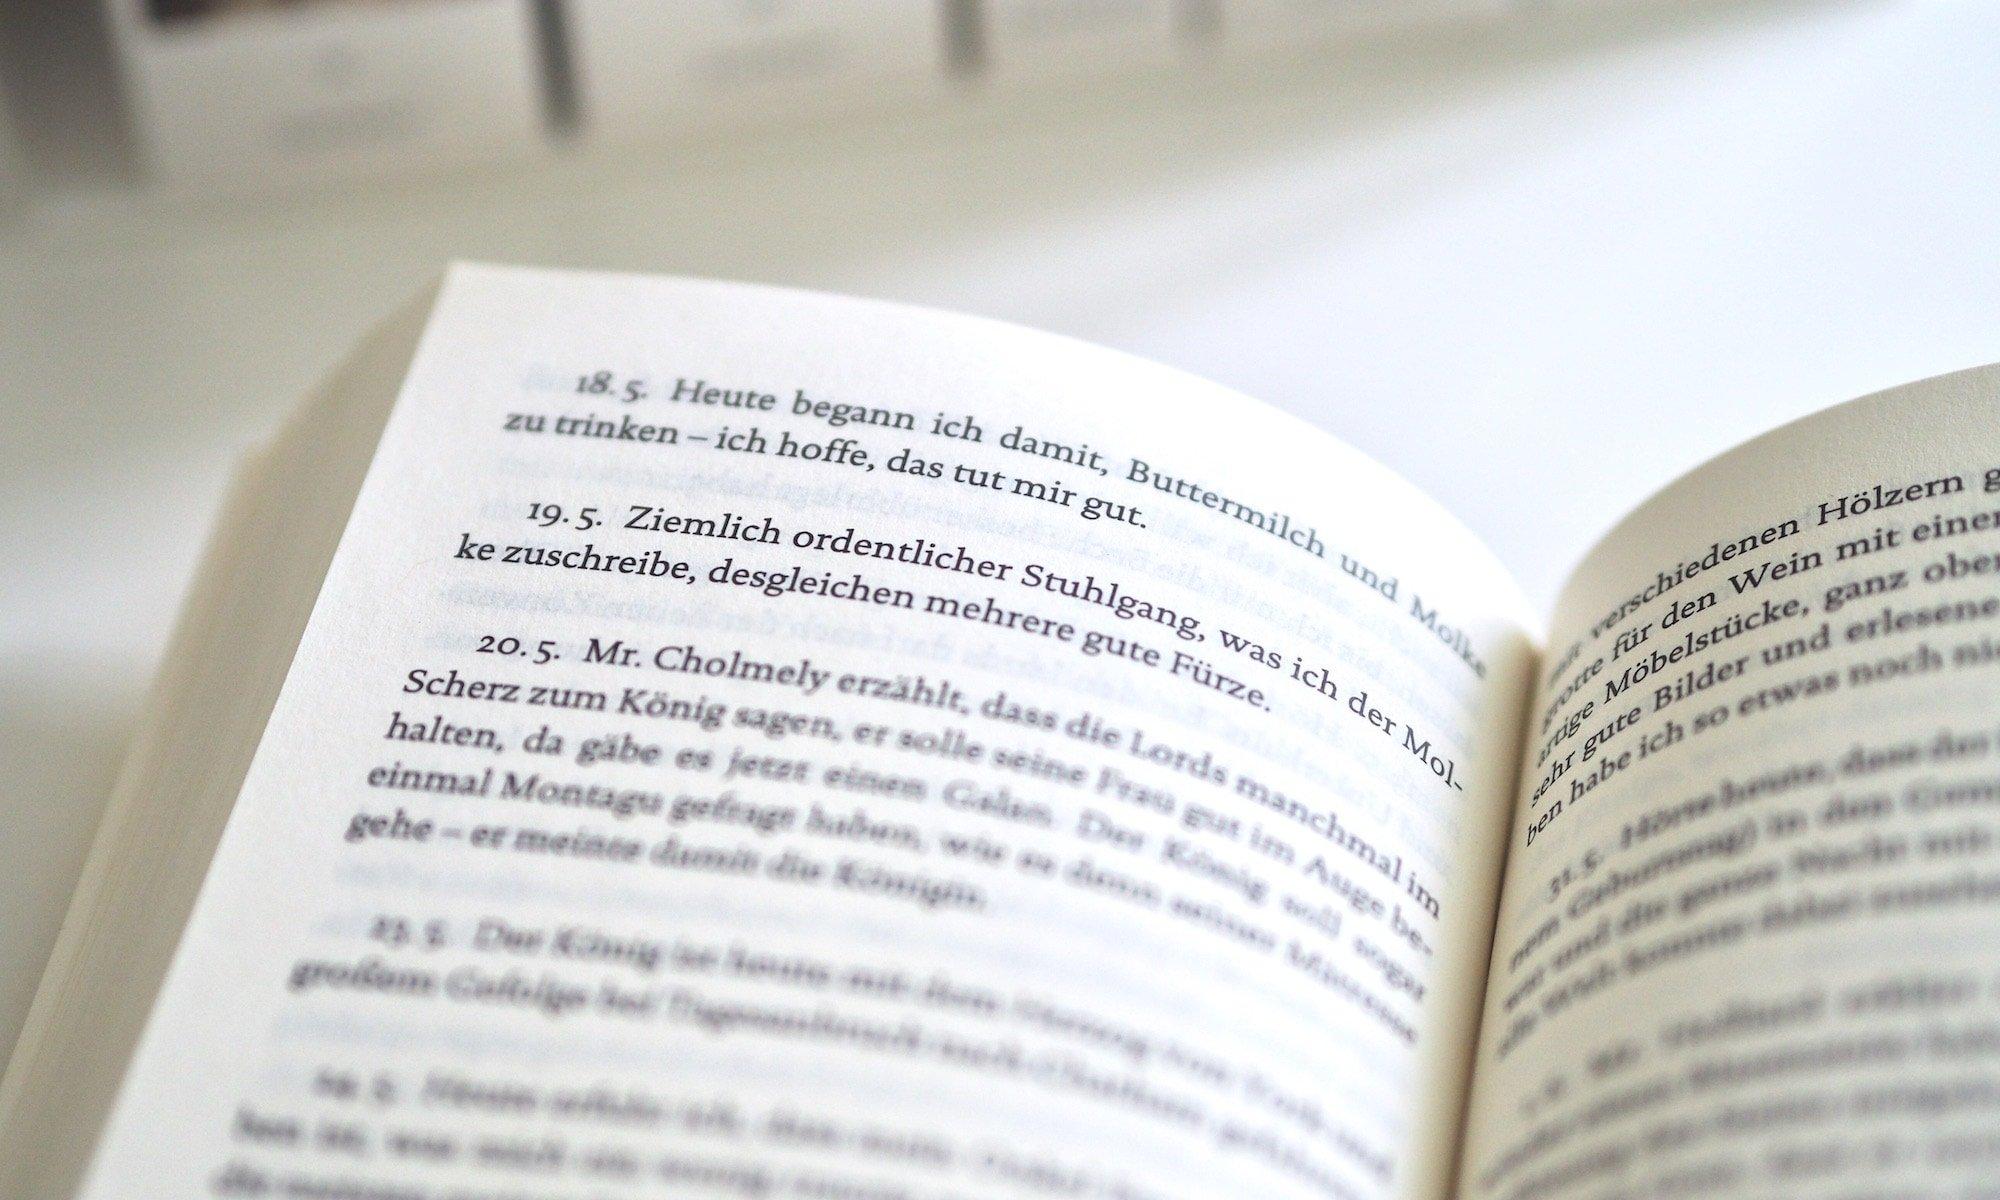 Samuel Pepys Tagebuch - Reclam | Foto: konsensor.de